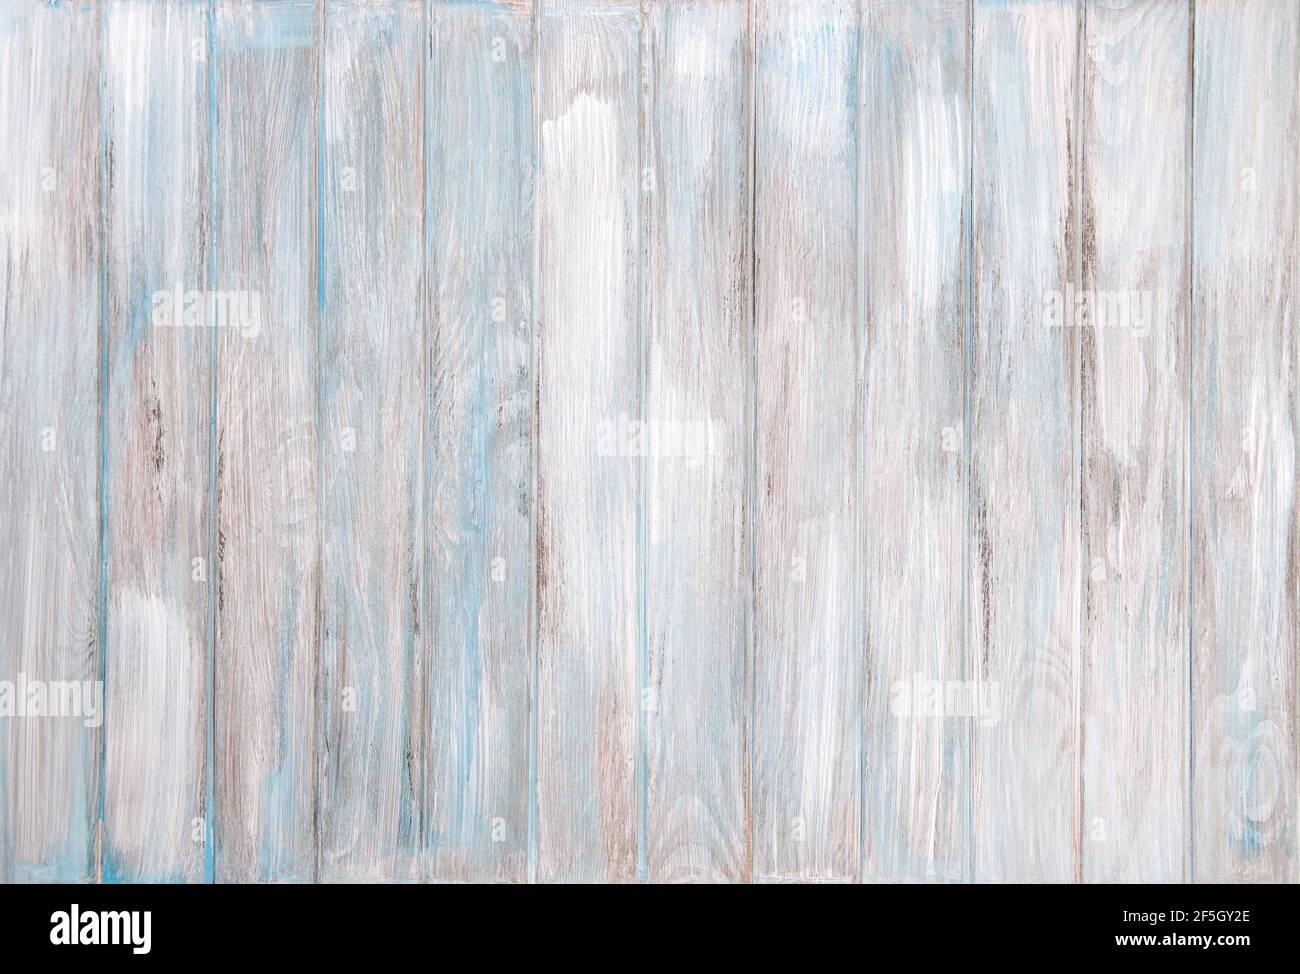 Fondo de madera de color azul. Textura de madera rústica natural Foto de stock